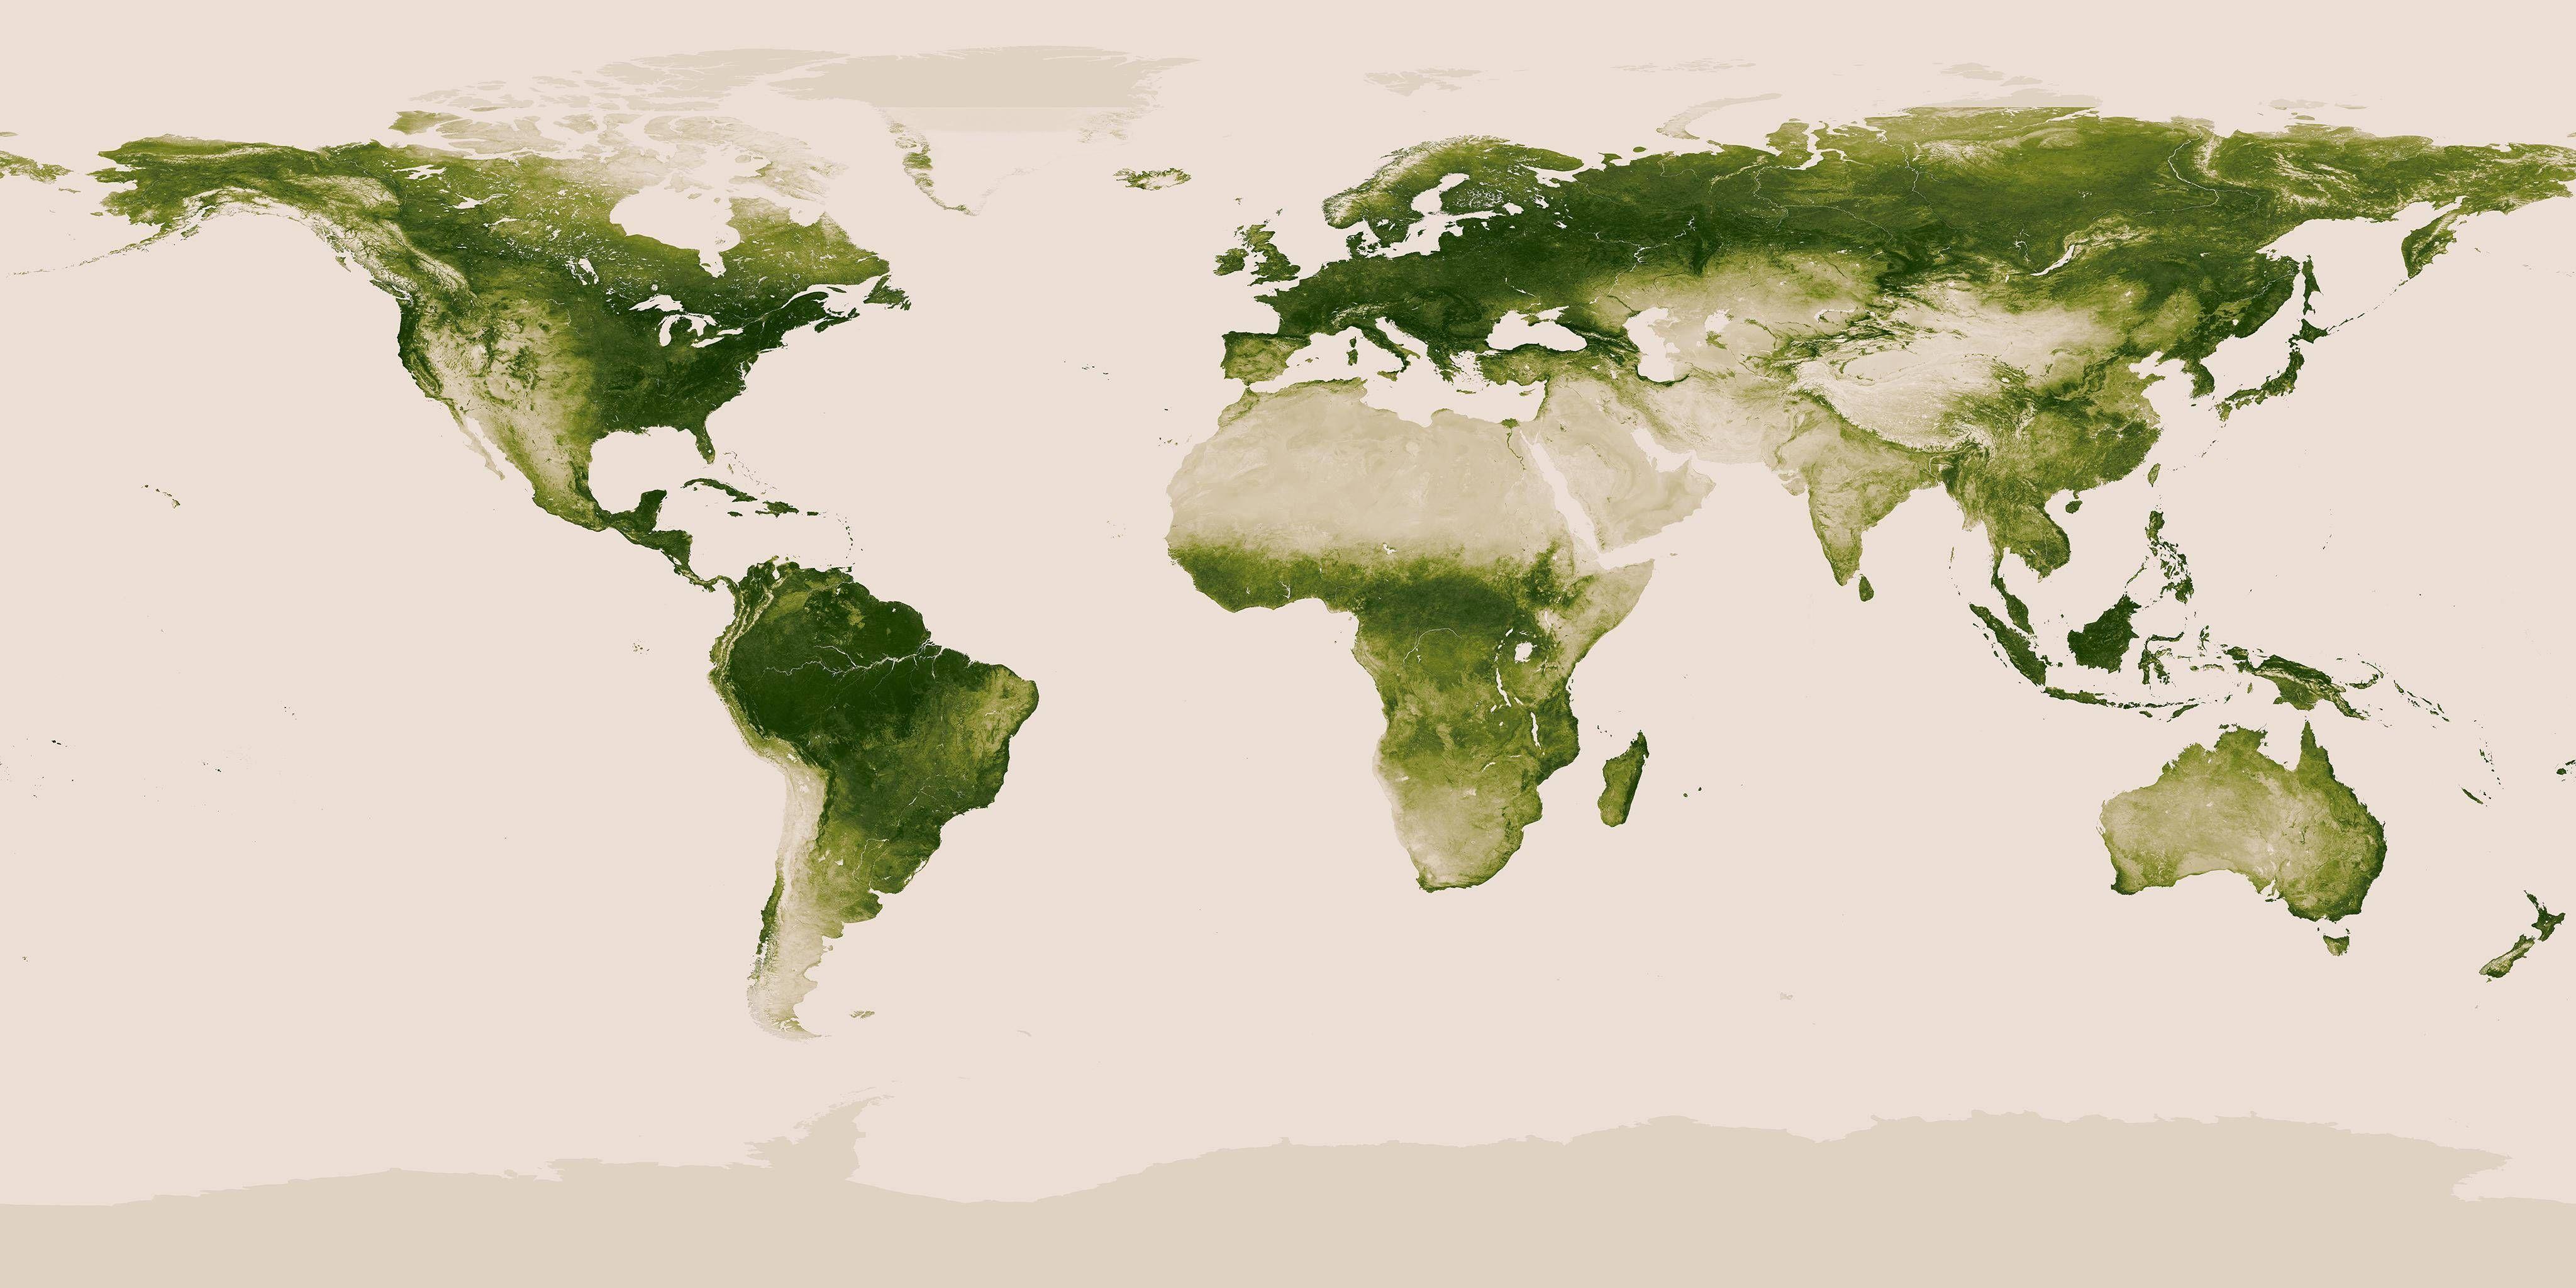 Map of the Earthu0027s vegetation 4096x2048